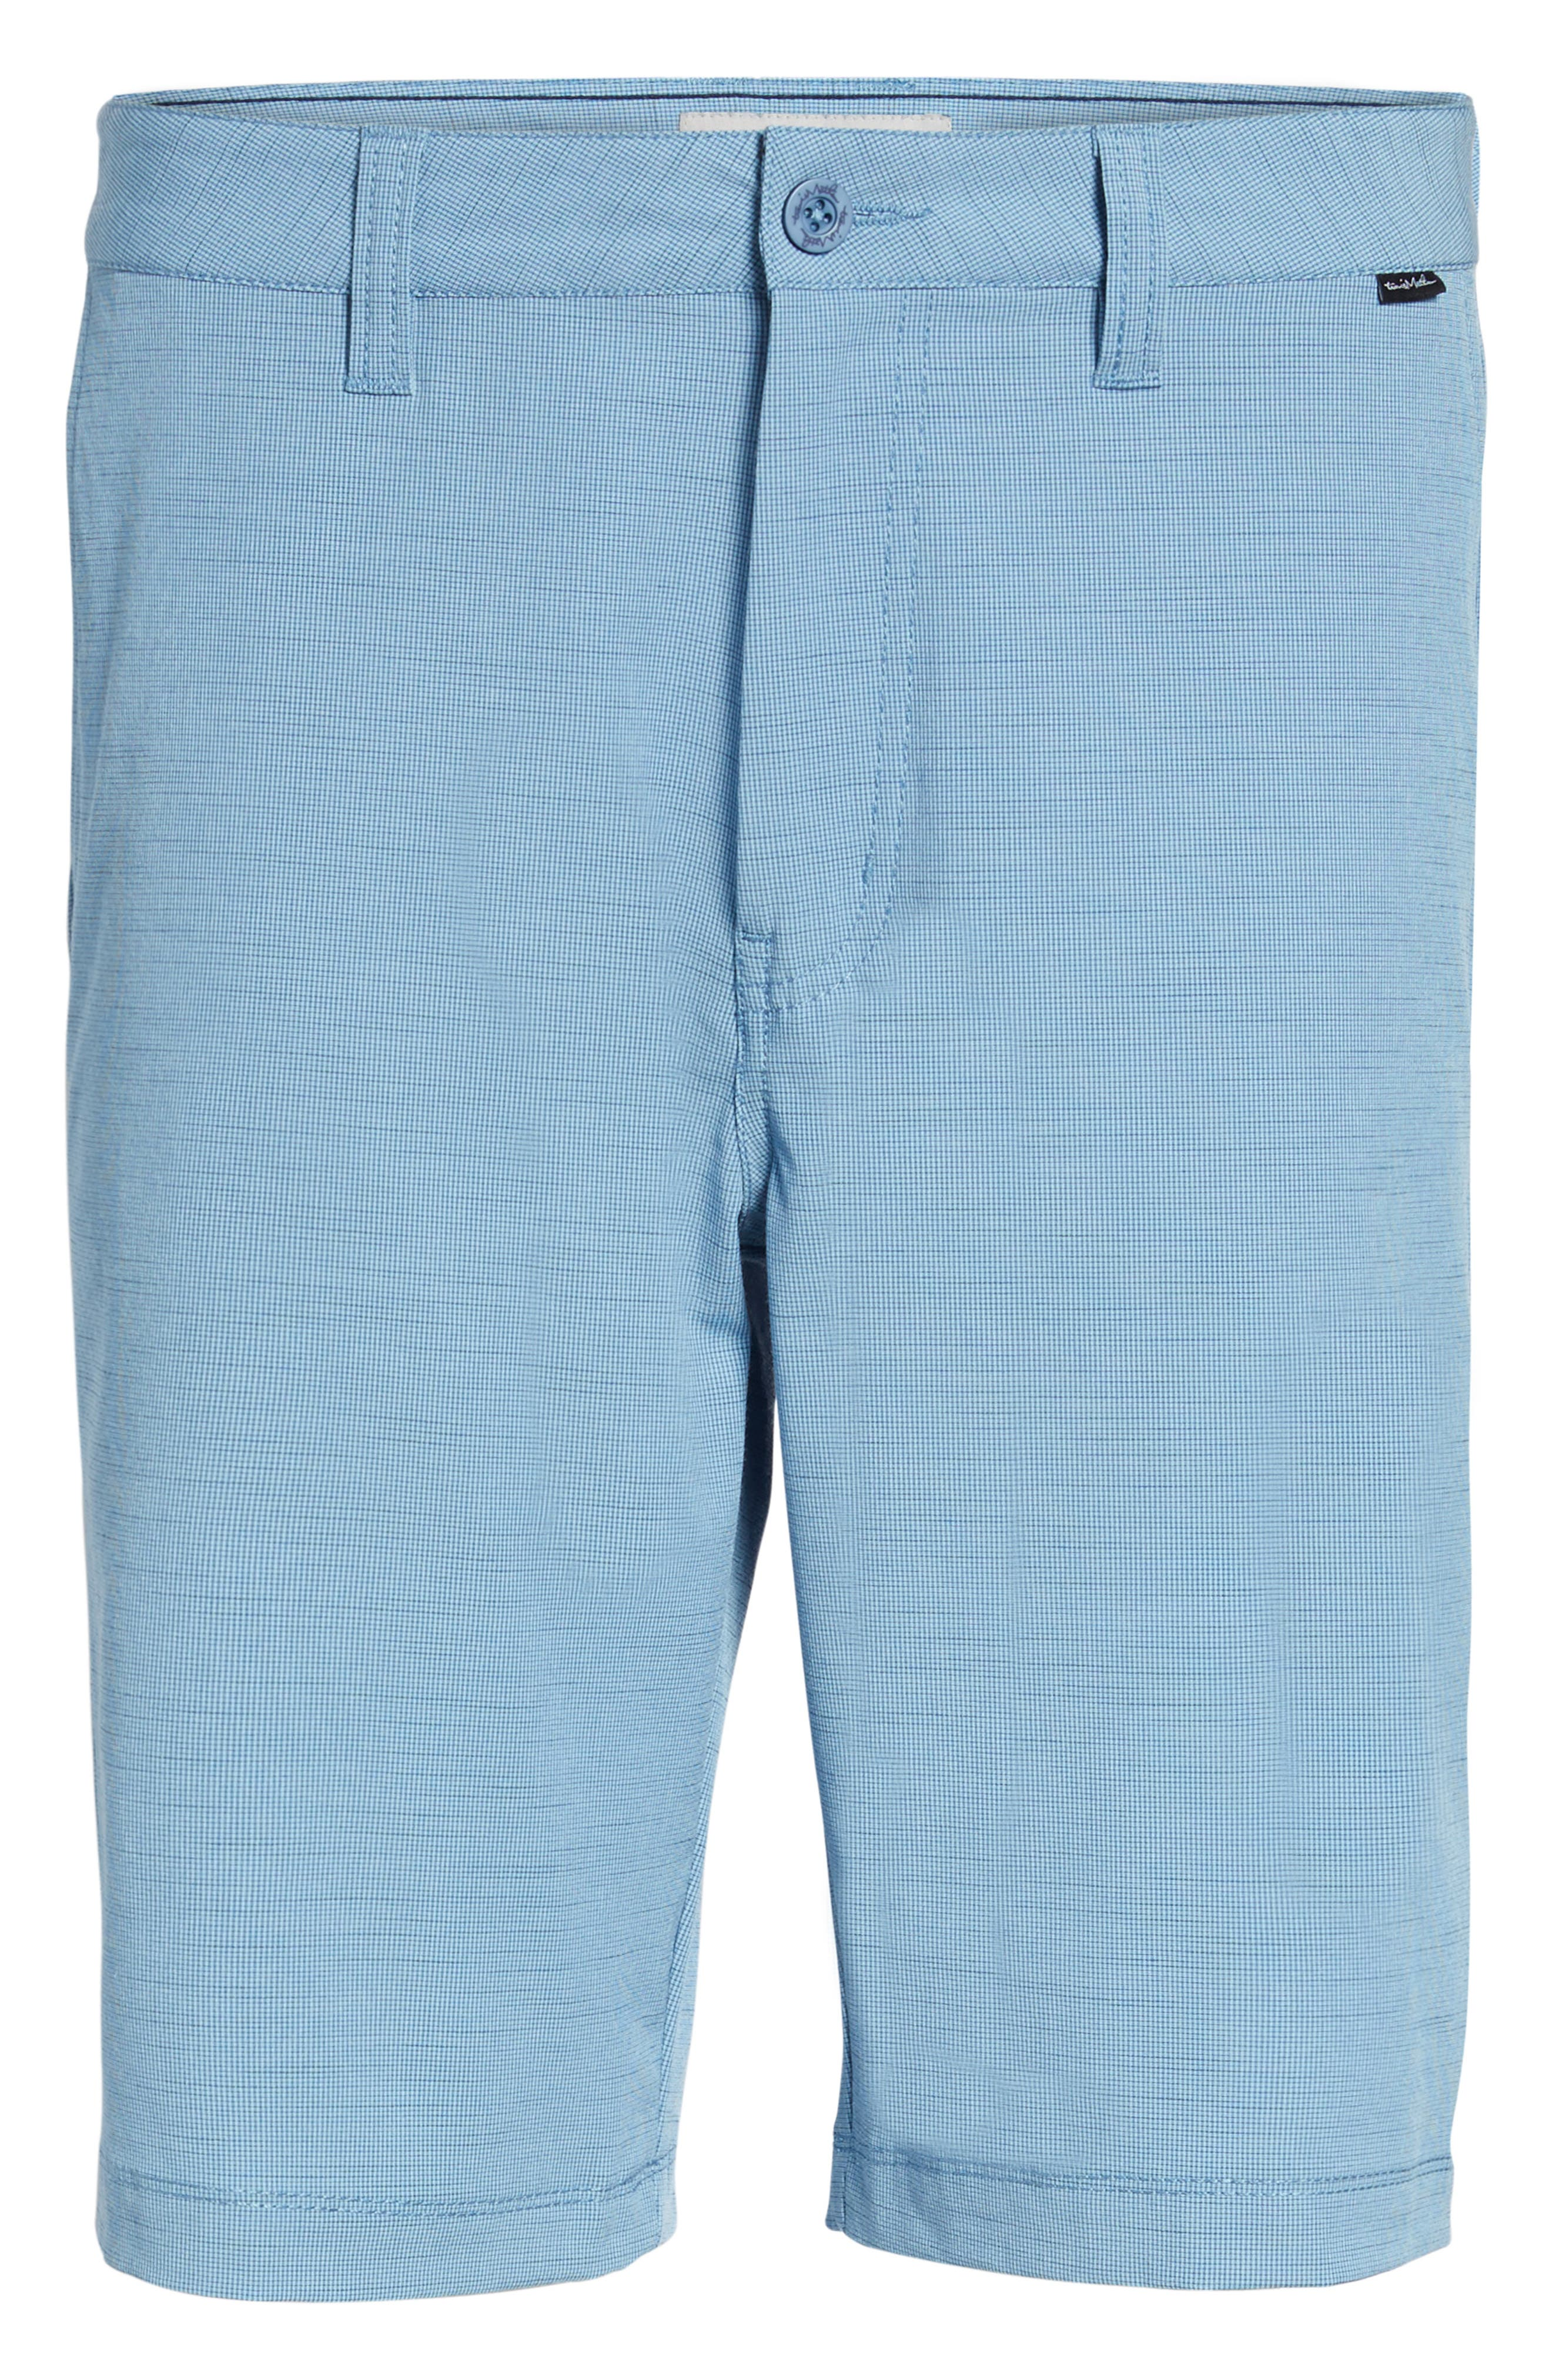 Fisher Shorts,                             Alternate thumbnail 6, color,                             401